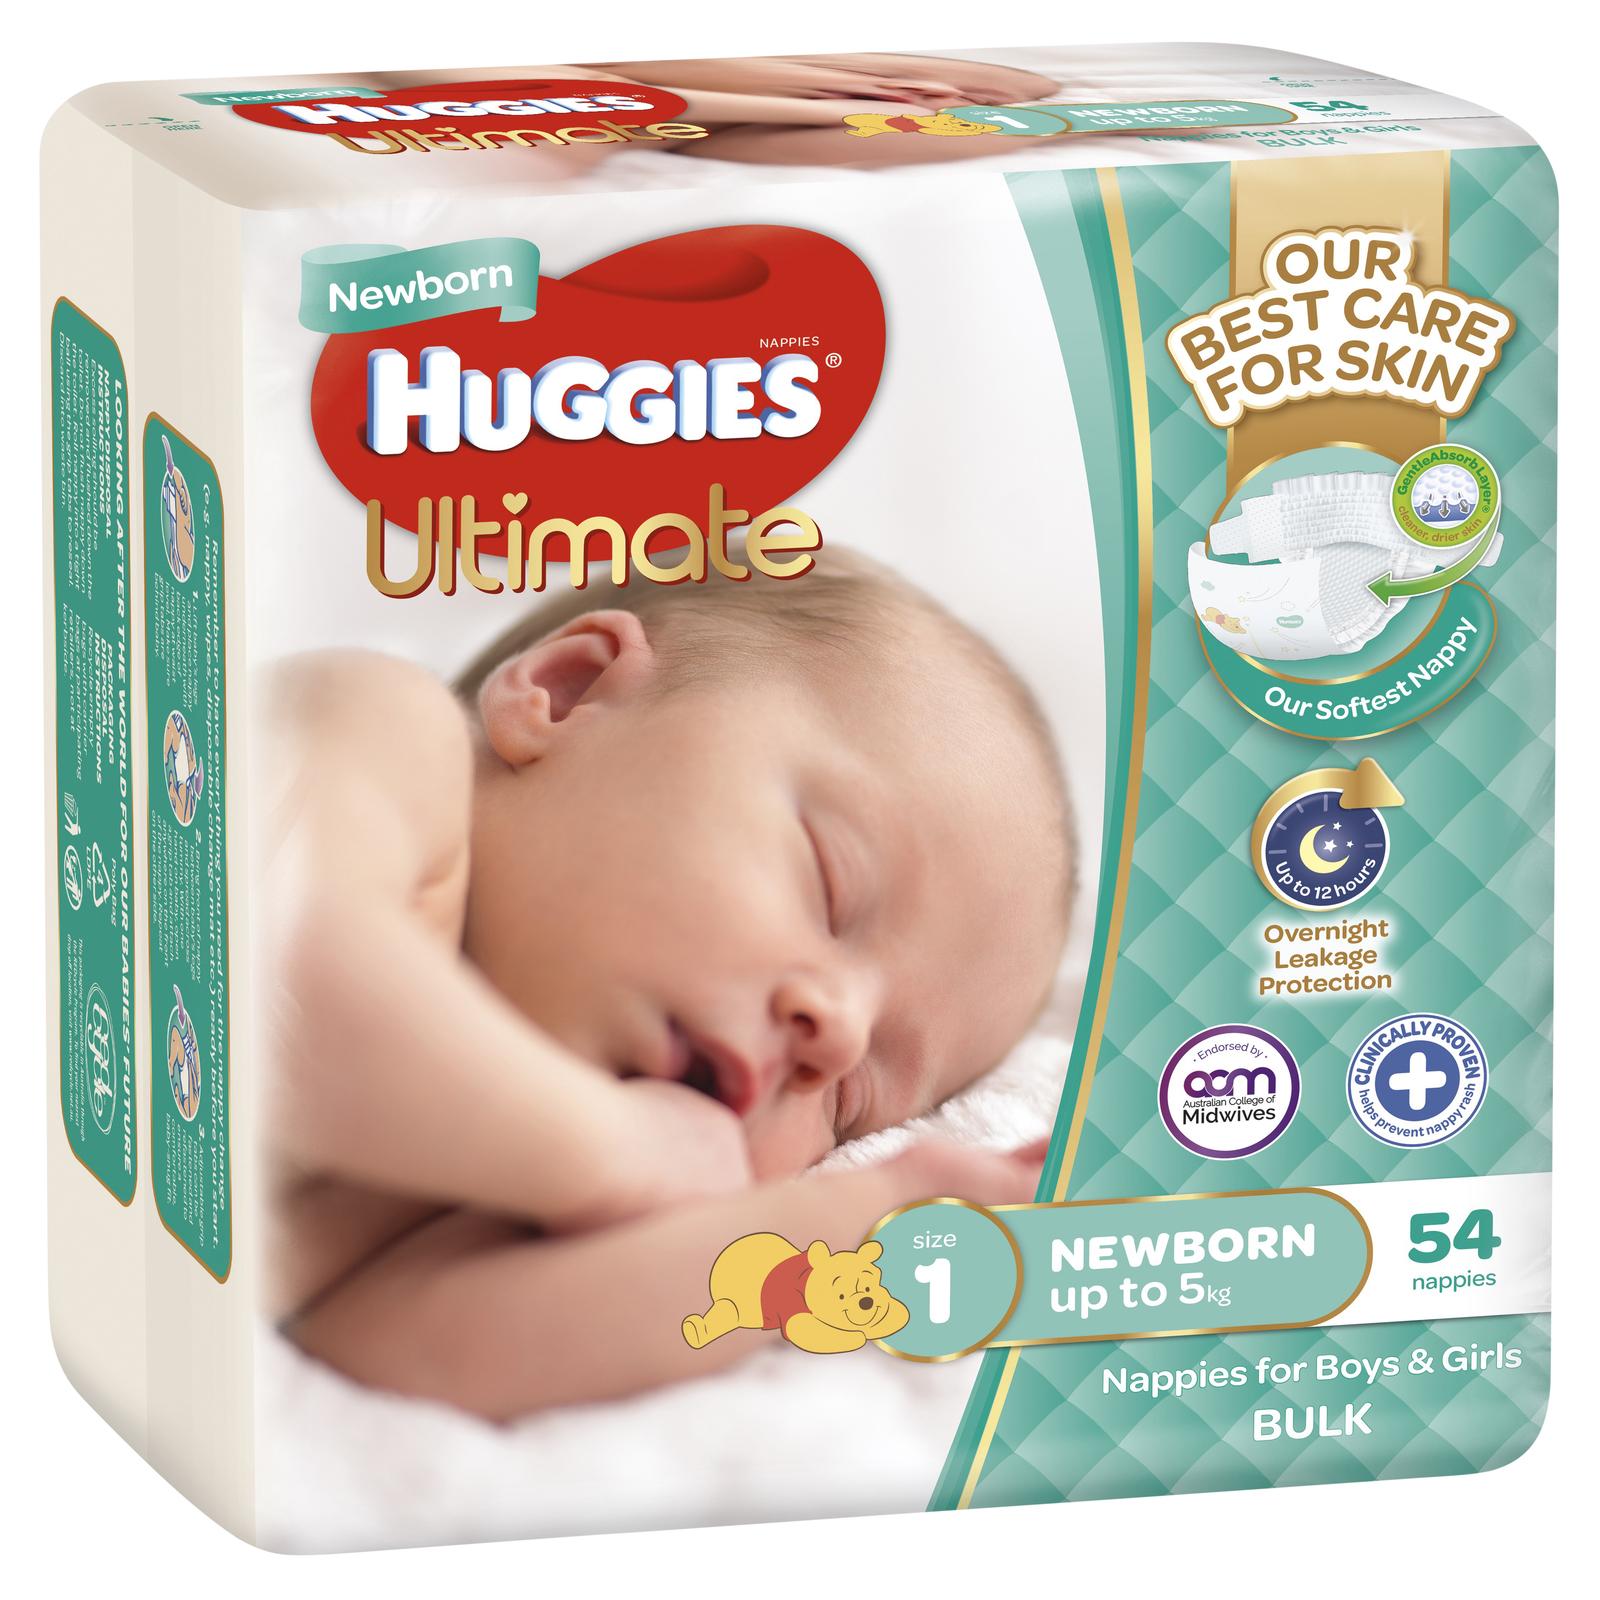 Huggies Ultimate Nappies Bulk - Newborn - Up to 5kg (54) image